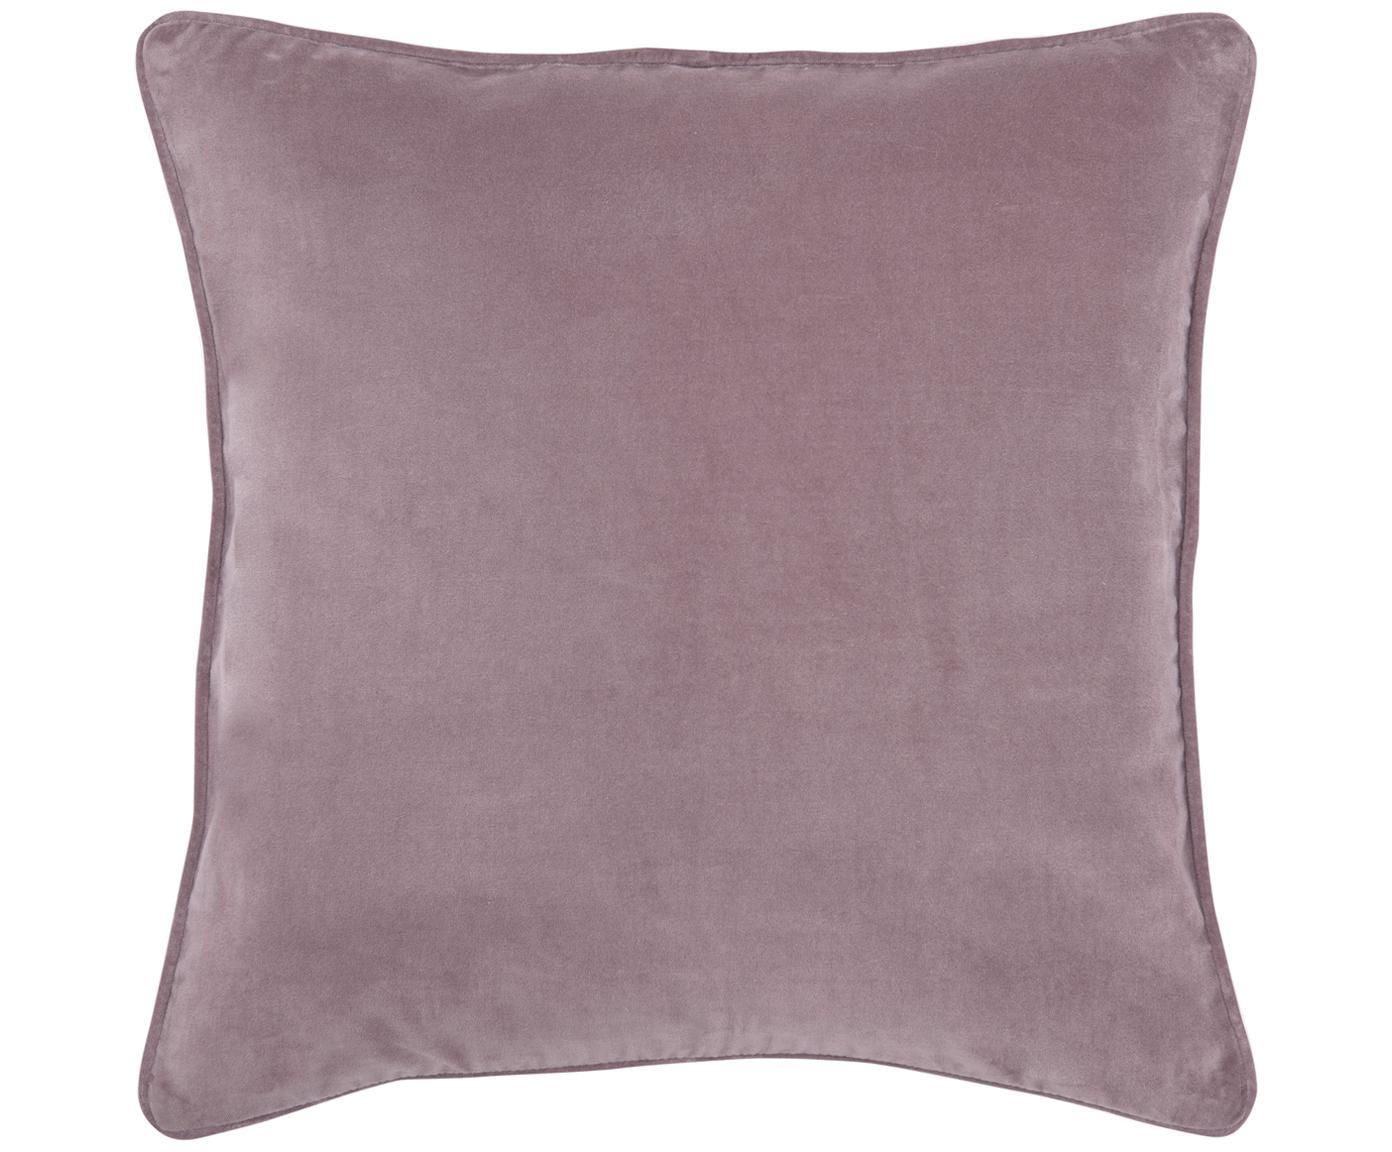 Einfarbige Samt-Kissenhülle Dana in Altrosa, 100% Baumwollsamt, Altrosa, 50 x 50 cm